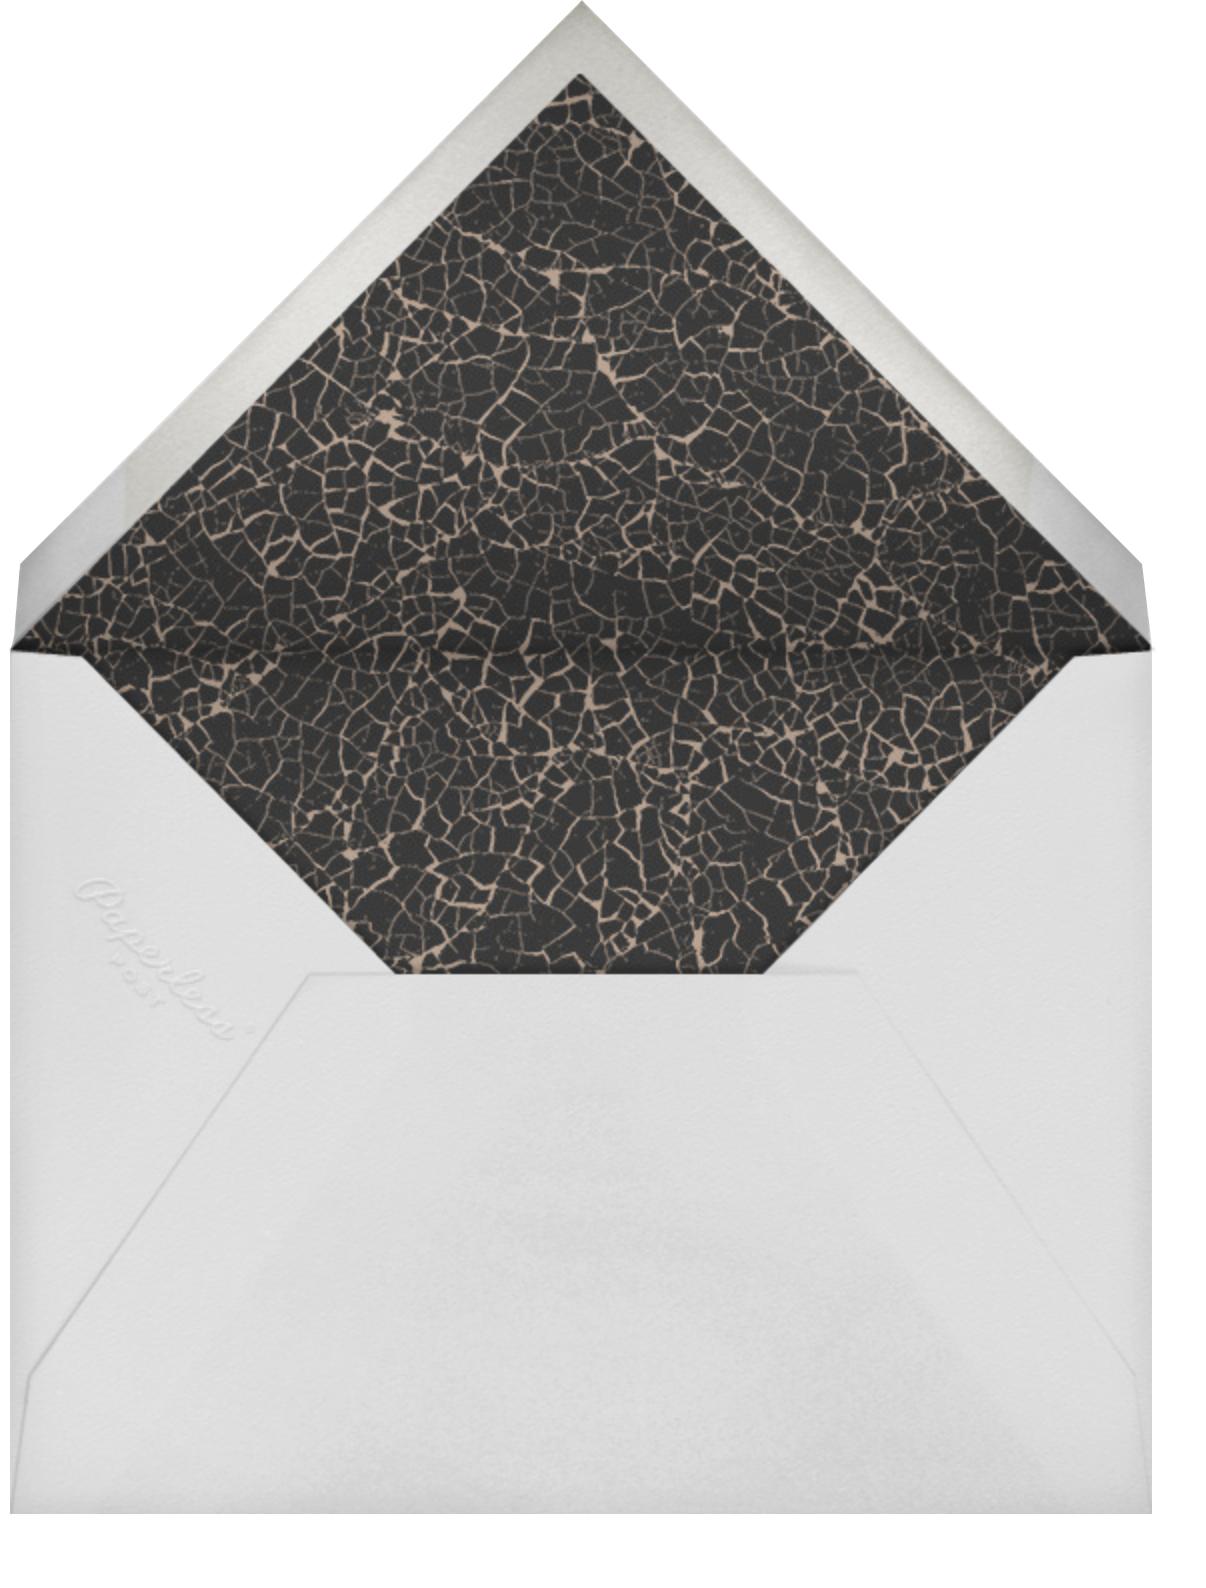 Woodcut - Walnut - Kelly Wearstler - Thanksgiving - envelope back